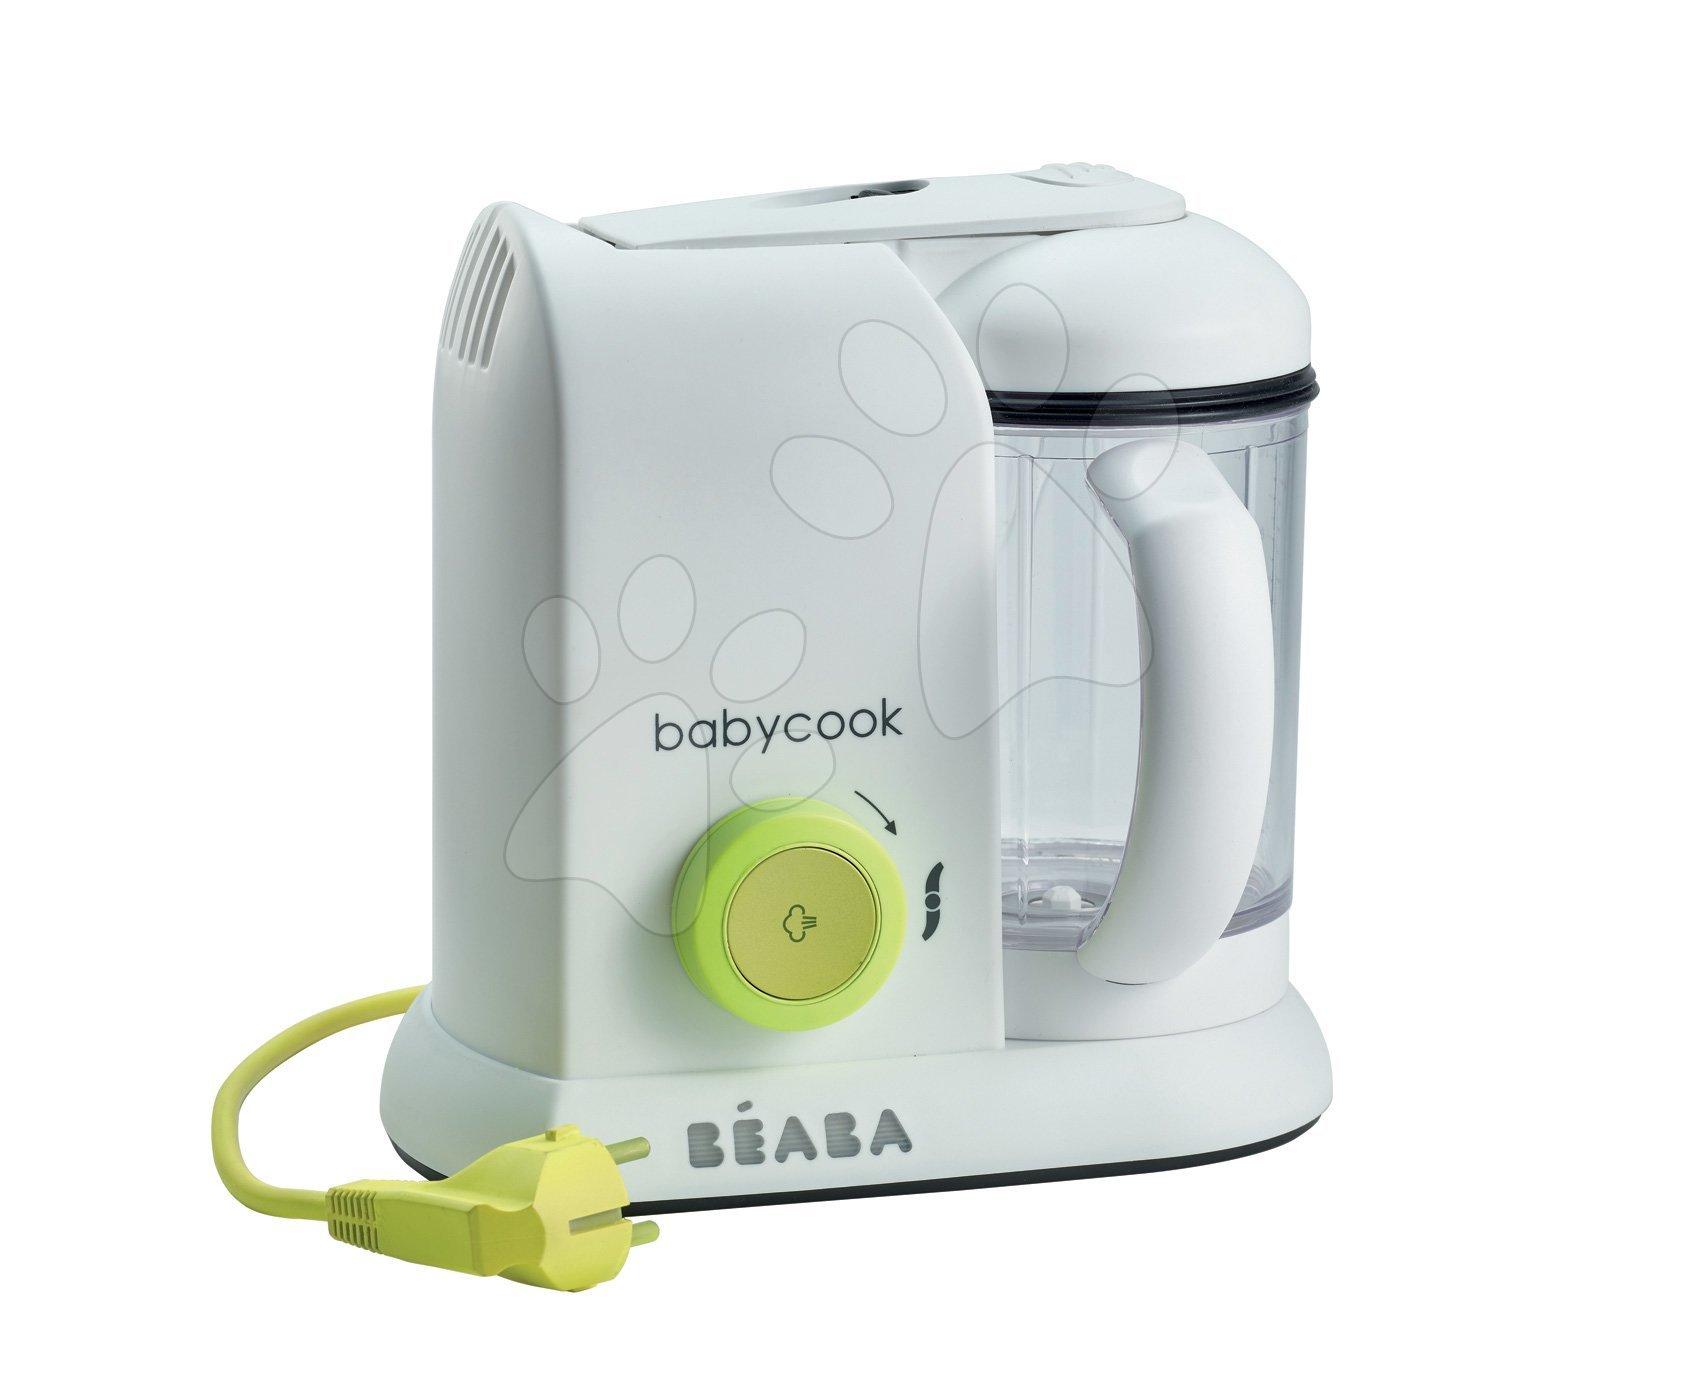 Beaba Babycook® Solo parný varič a mixér 912462 neón